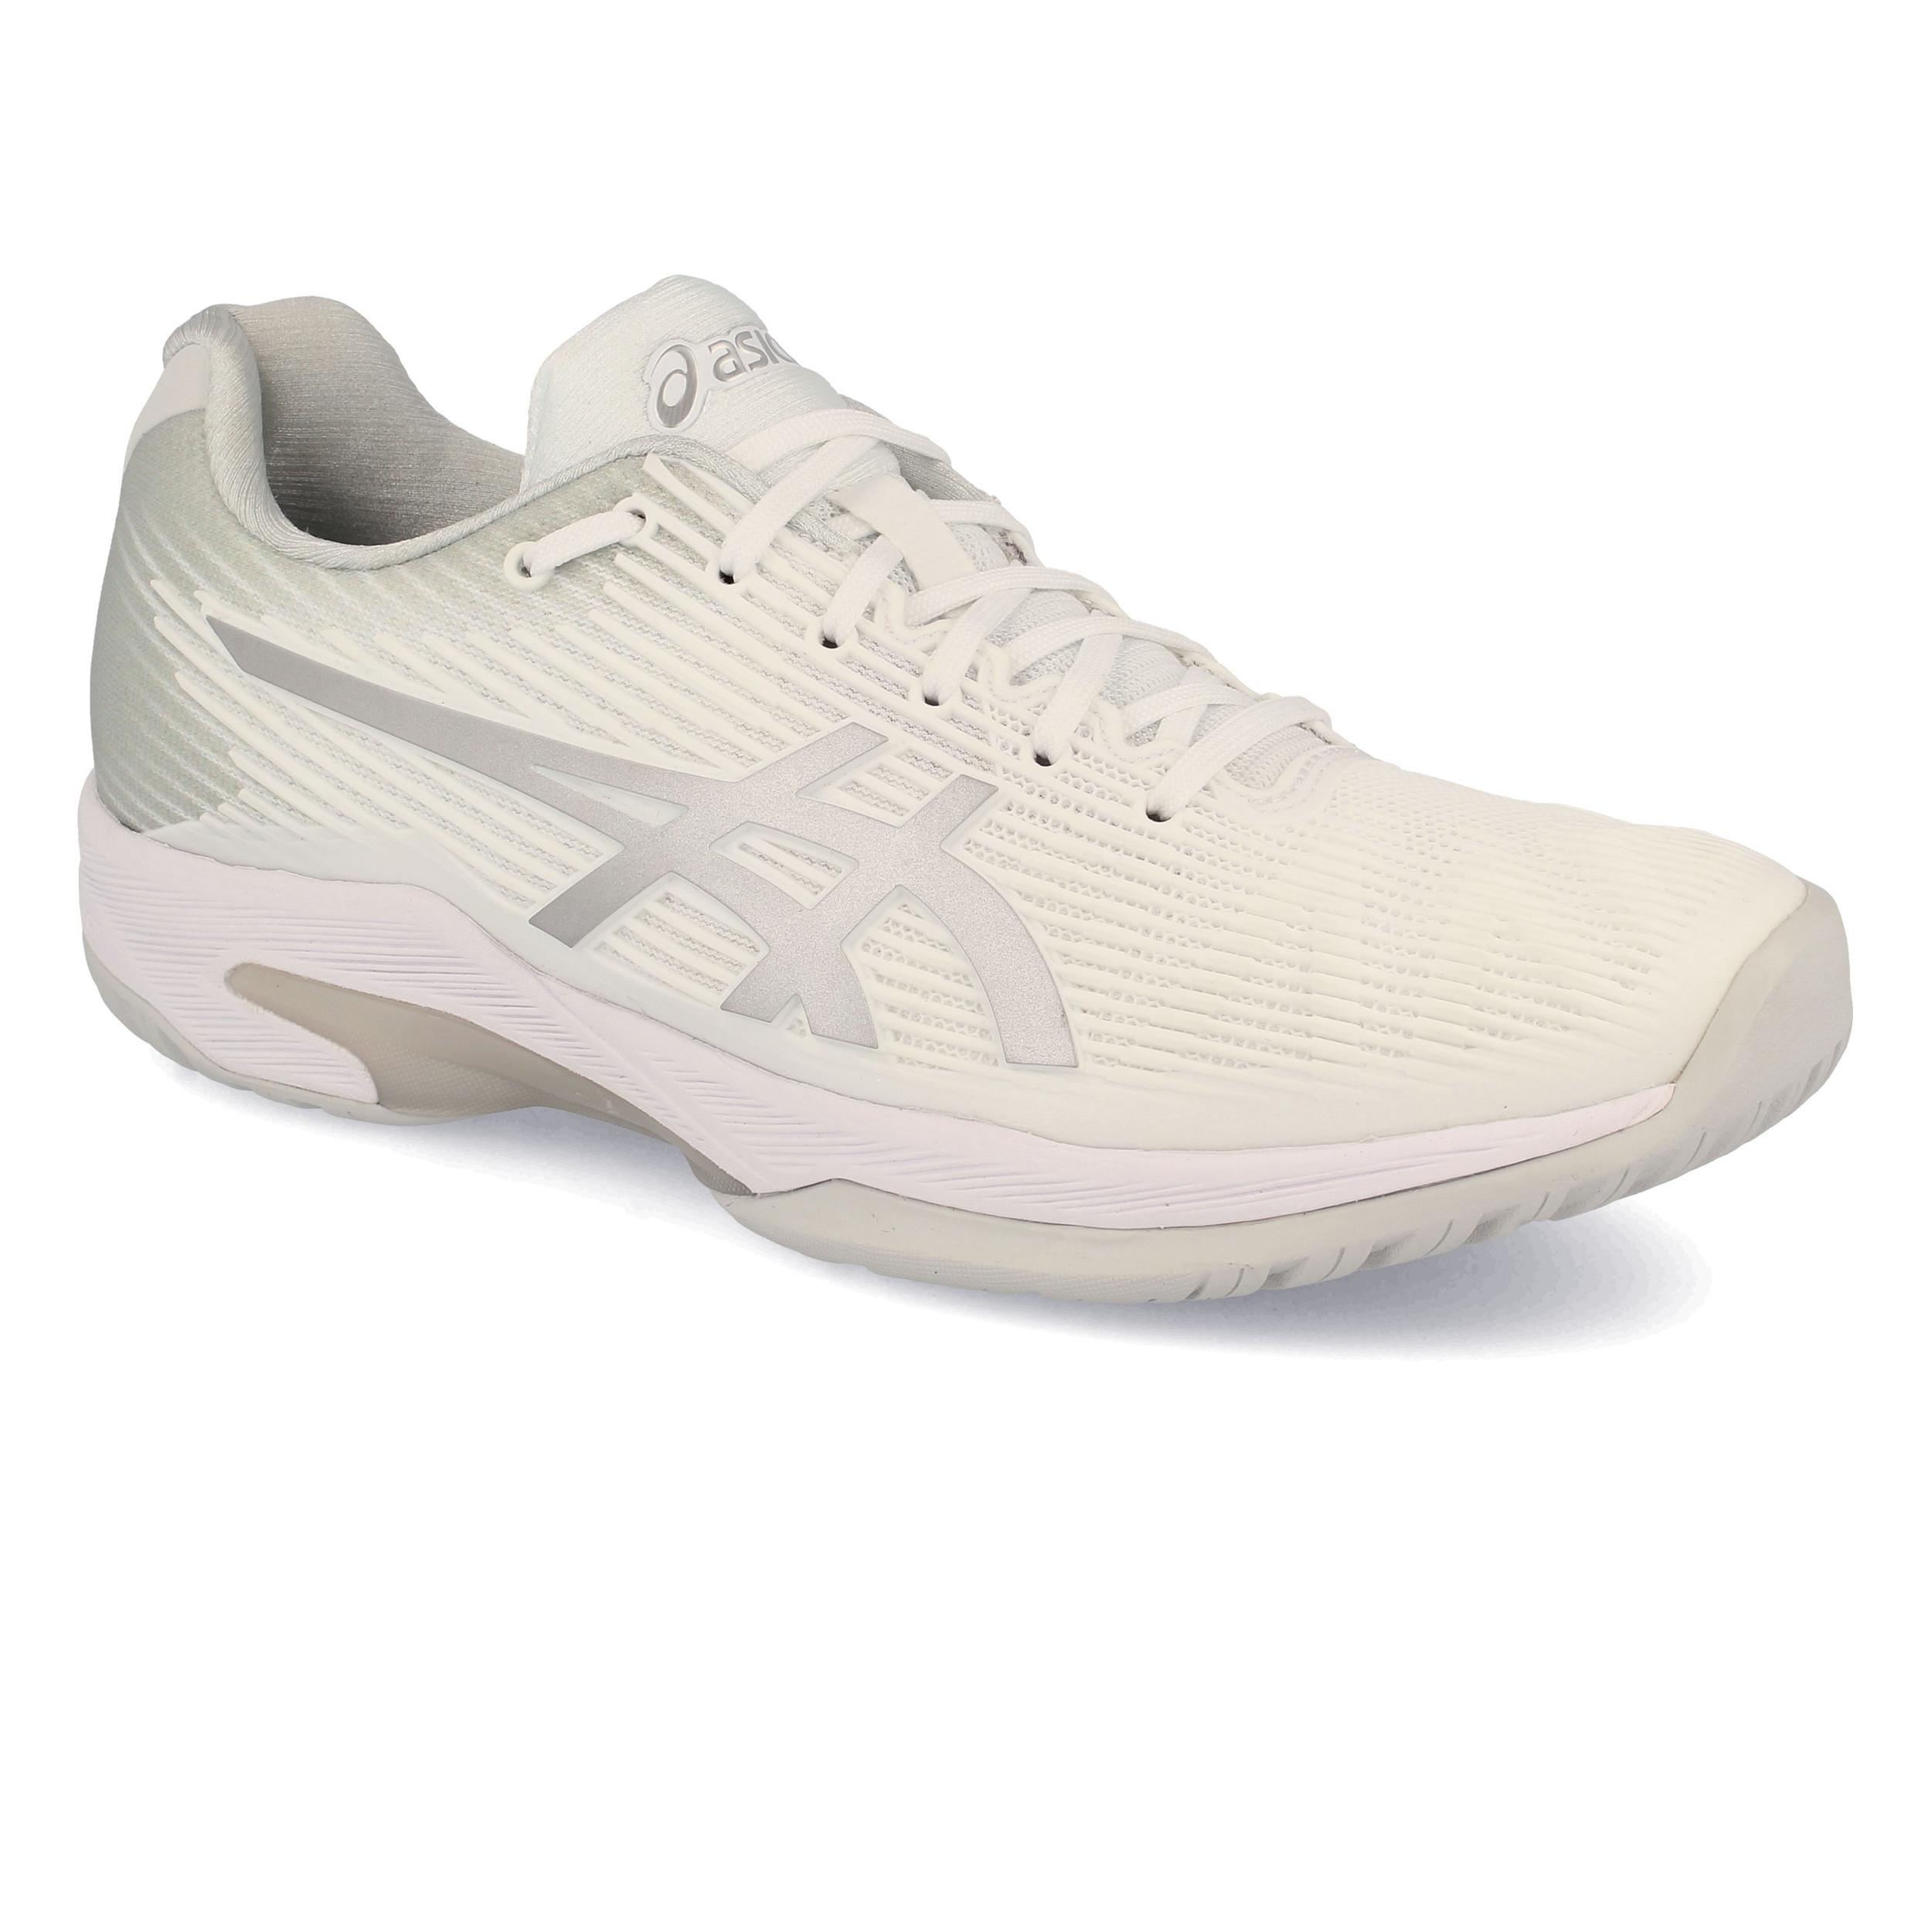 ASICS Uomo Gel Solution Speed FF Scarpe da Tennis Ginnastica Bianco Sport 3cc7873883f